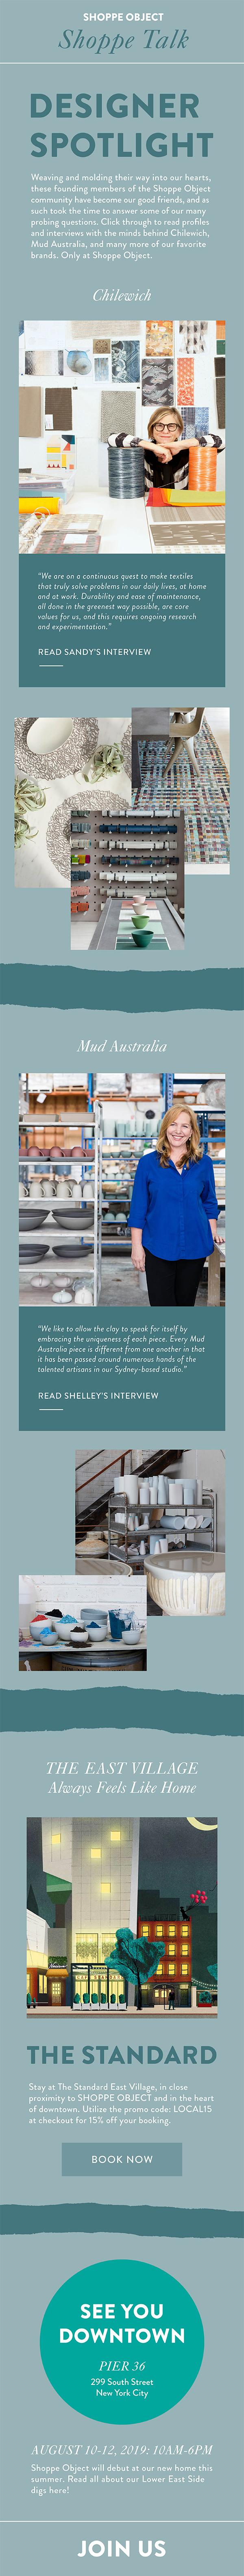 ShoppeTalk_Chilewich & Mudd Australia.jpg